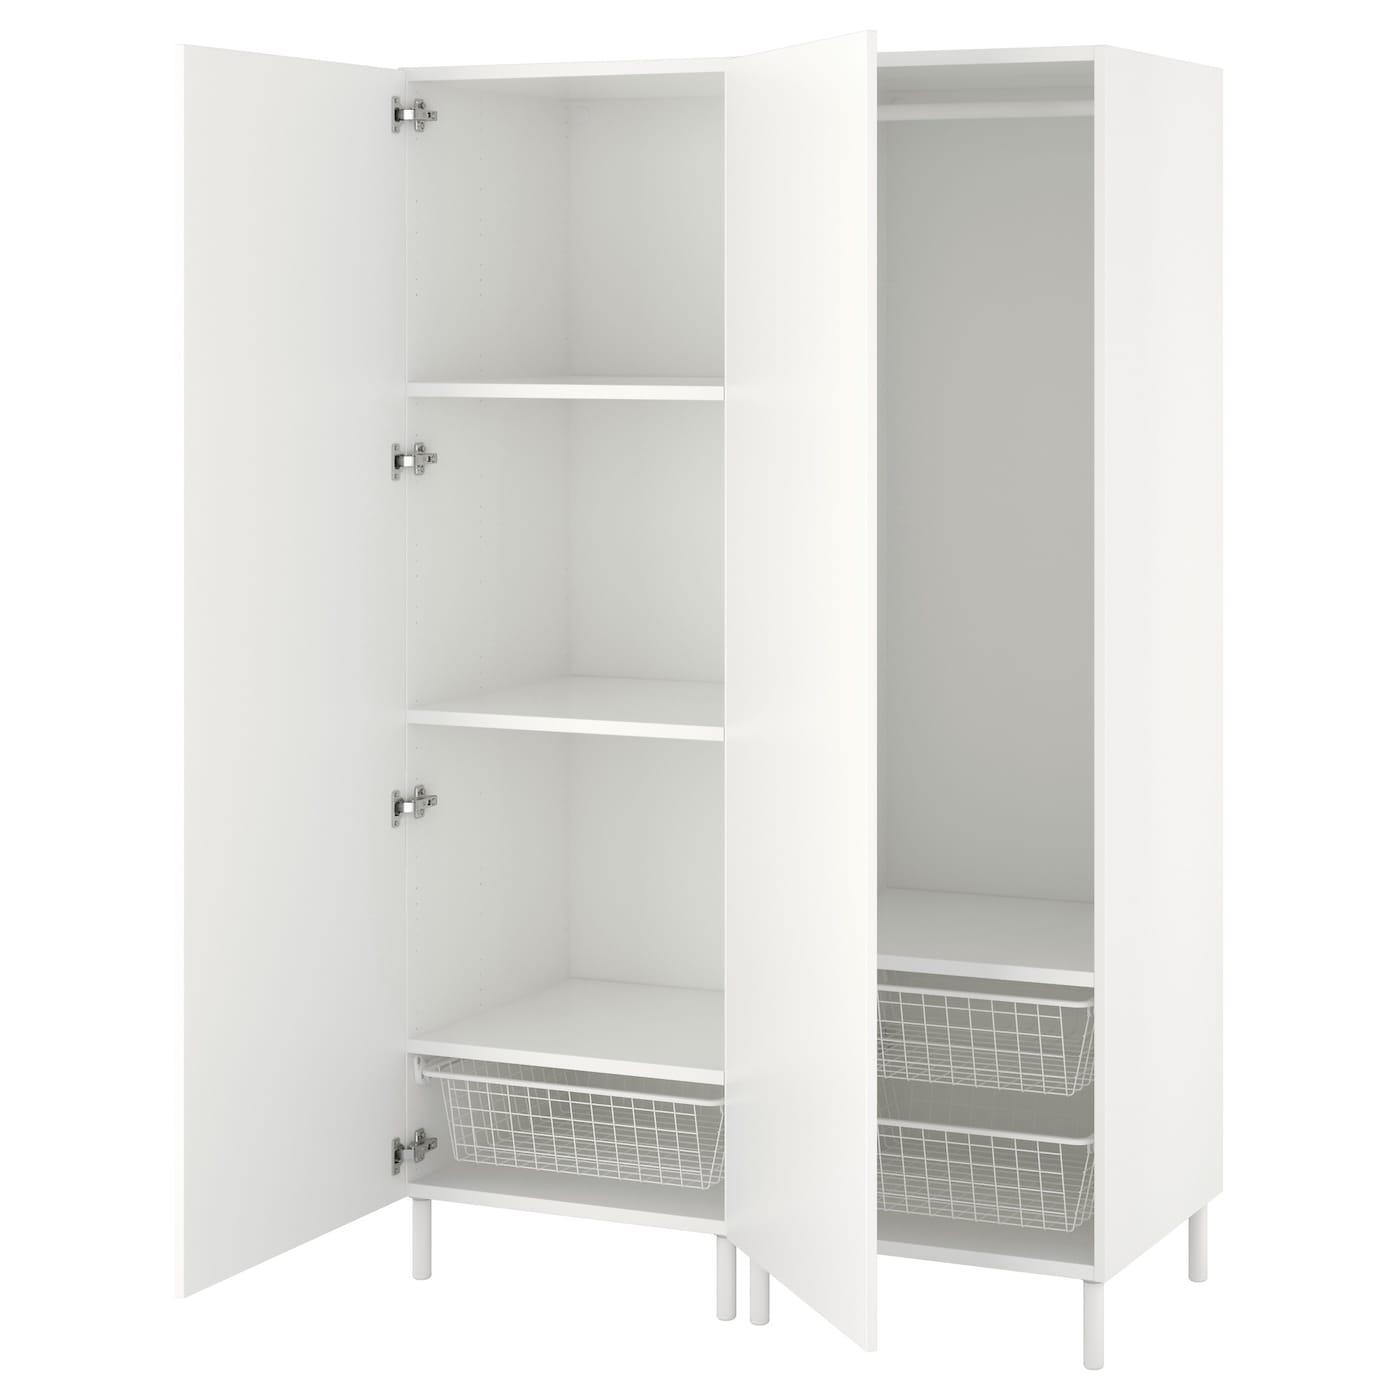 platsa wardrobe white fonnes white 120 x 57 x 191 cm ikea. Black Bedroom Furniture Sets. Home Design Ideas